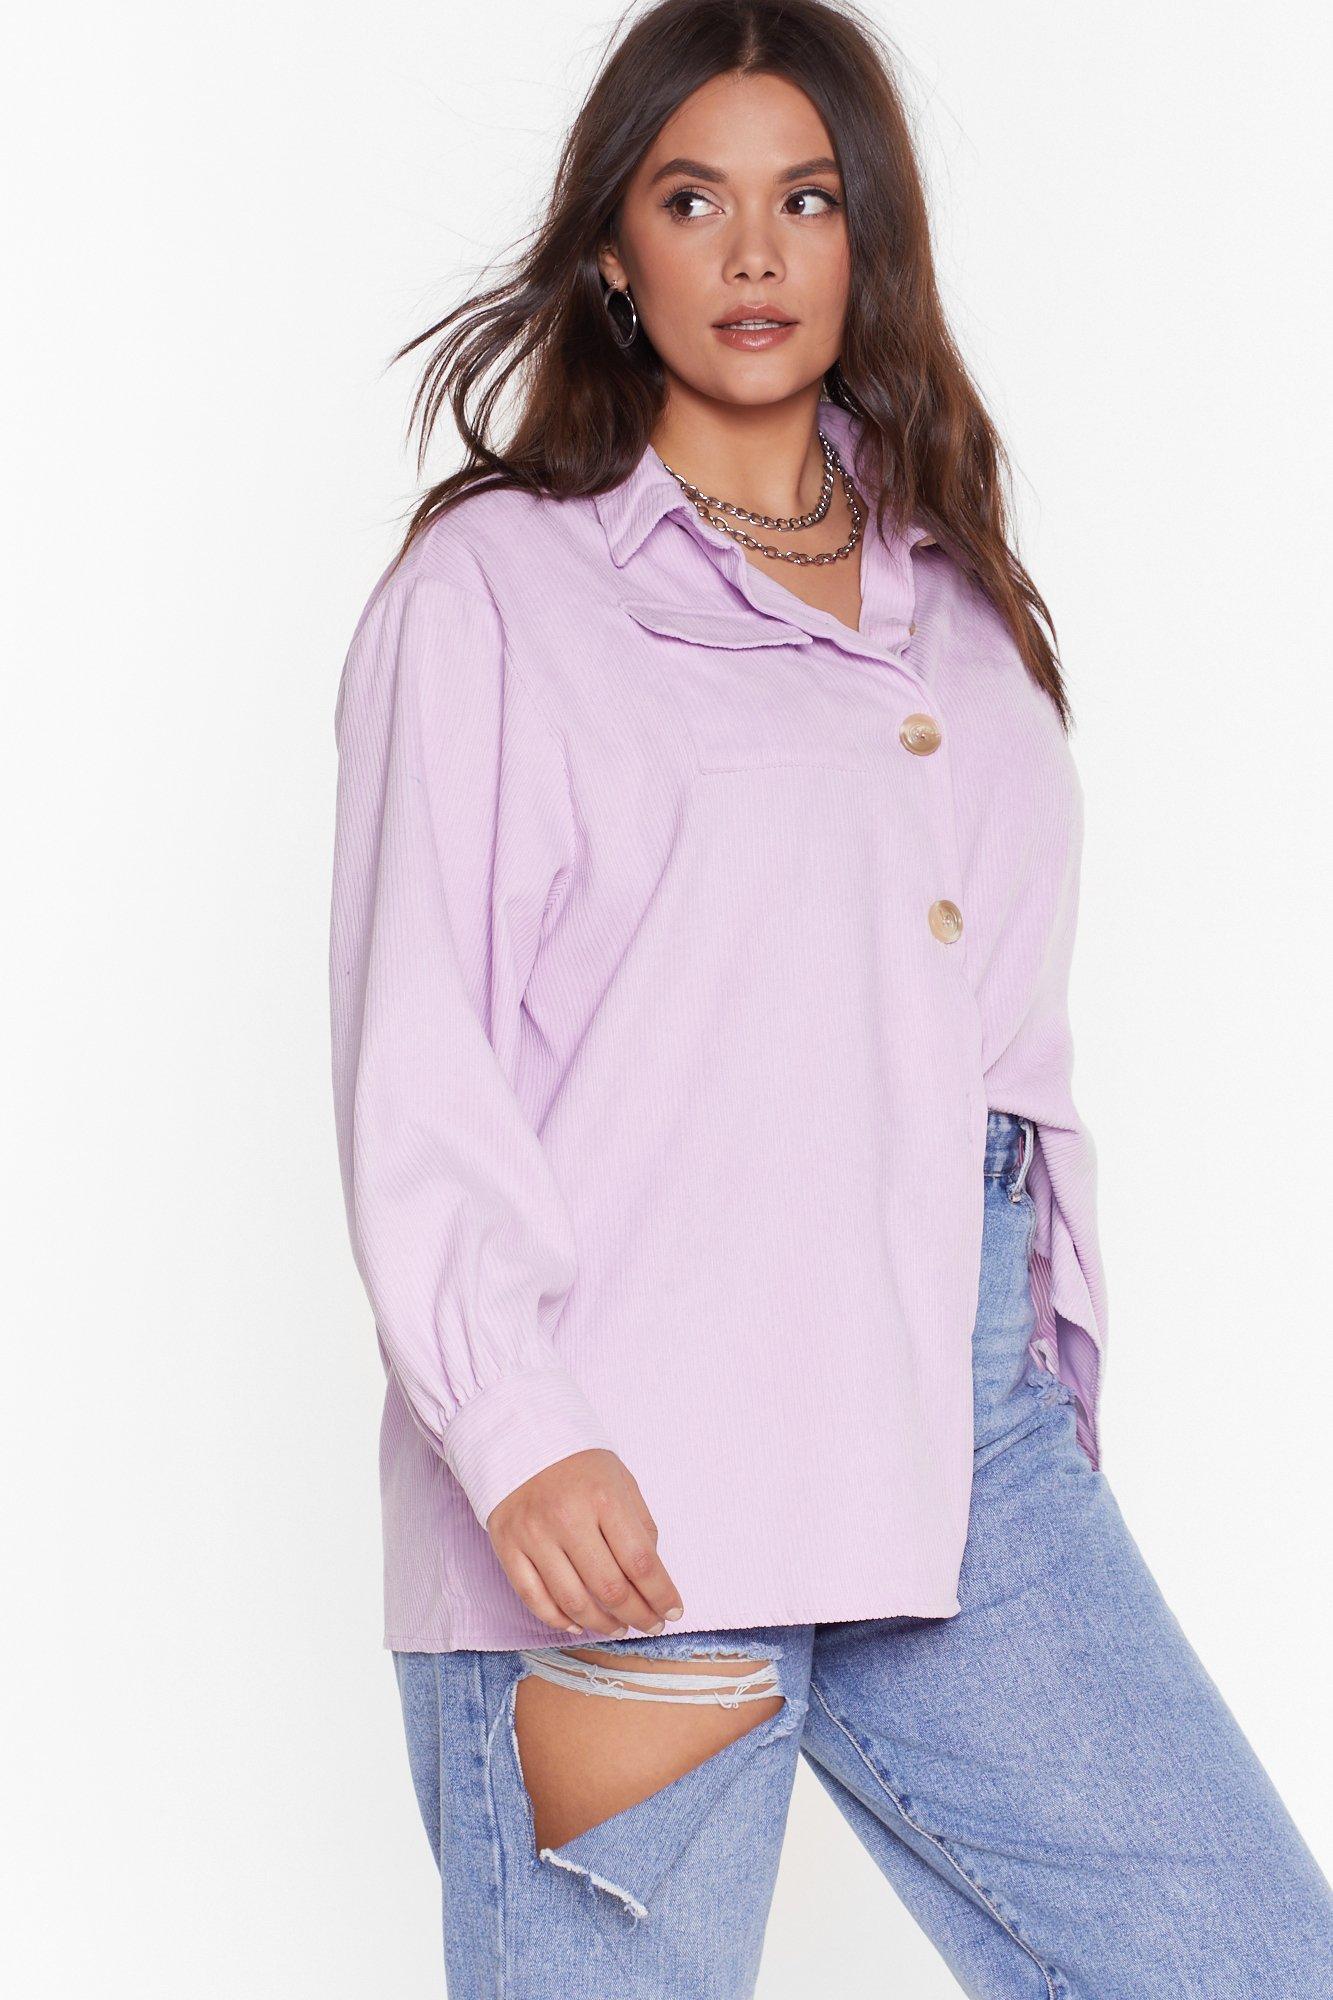 Image of Don't Texture Back Plus Corduroy Shirt